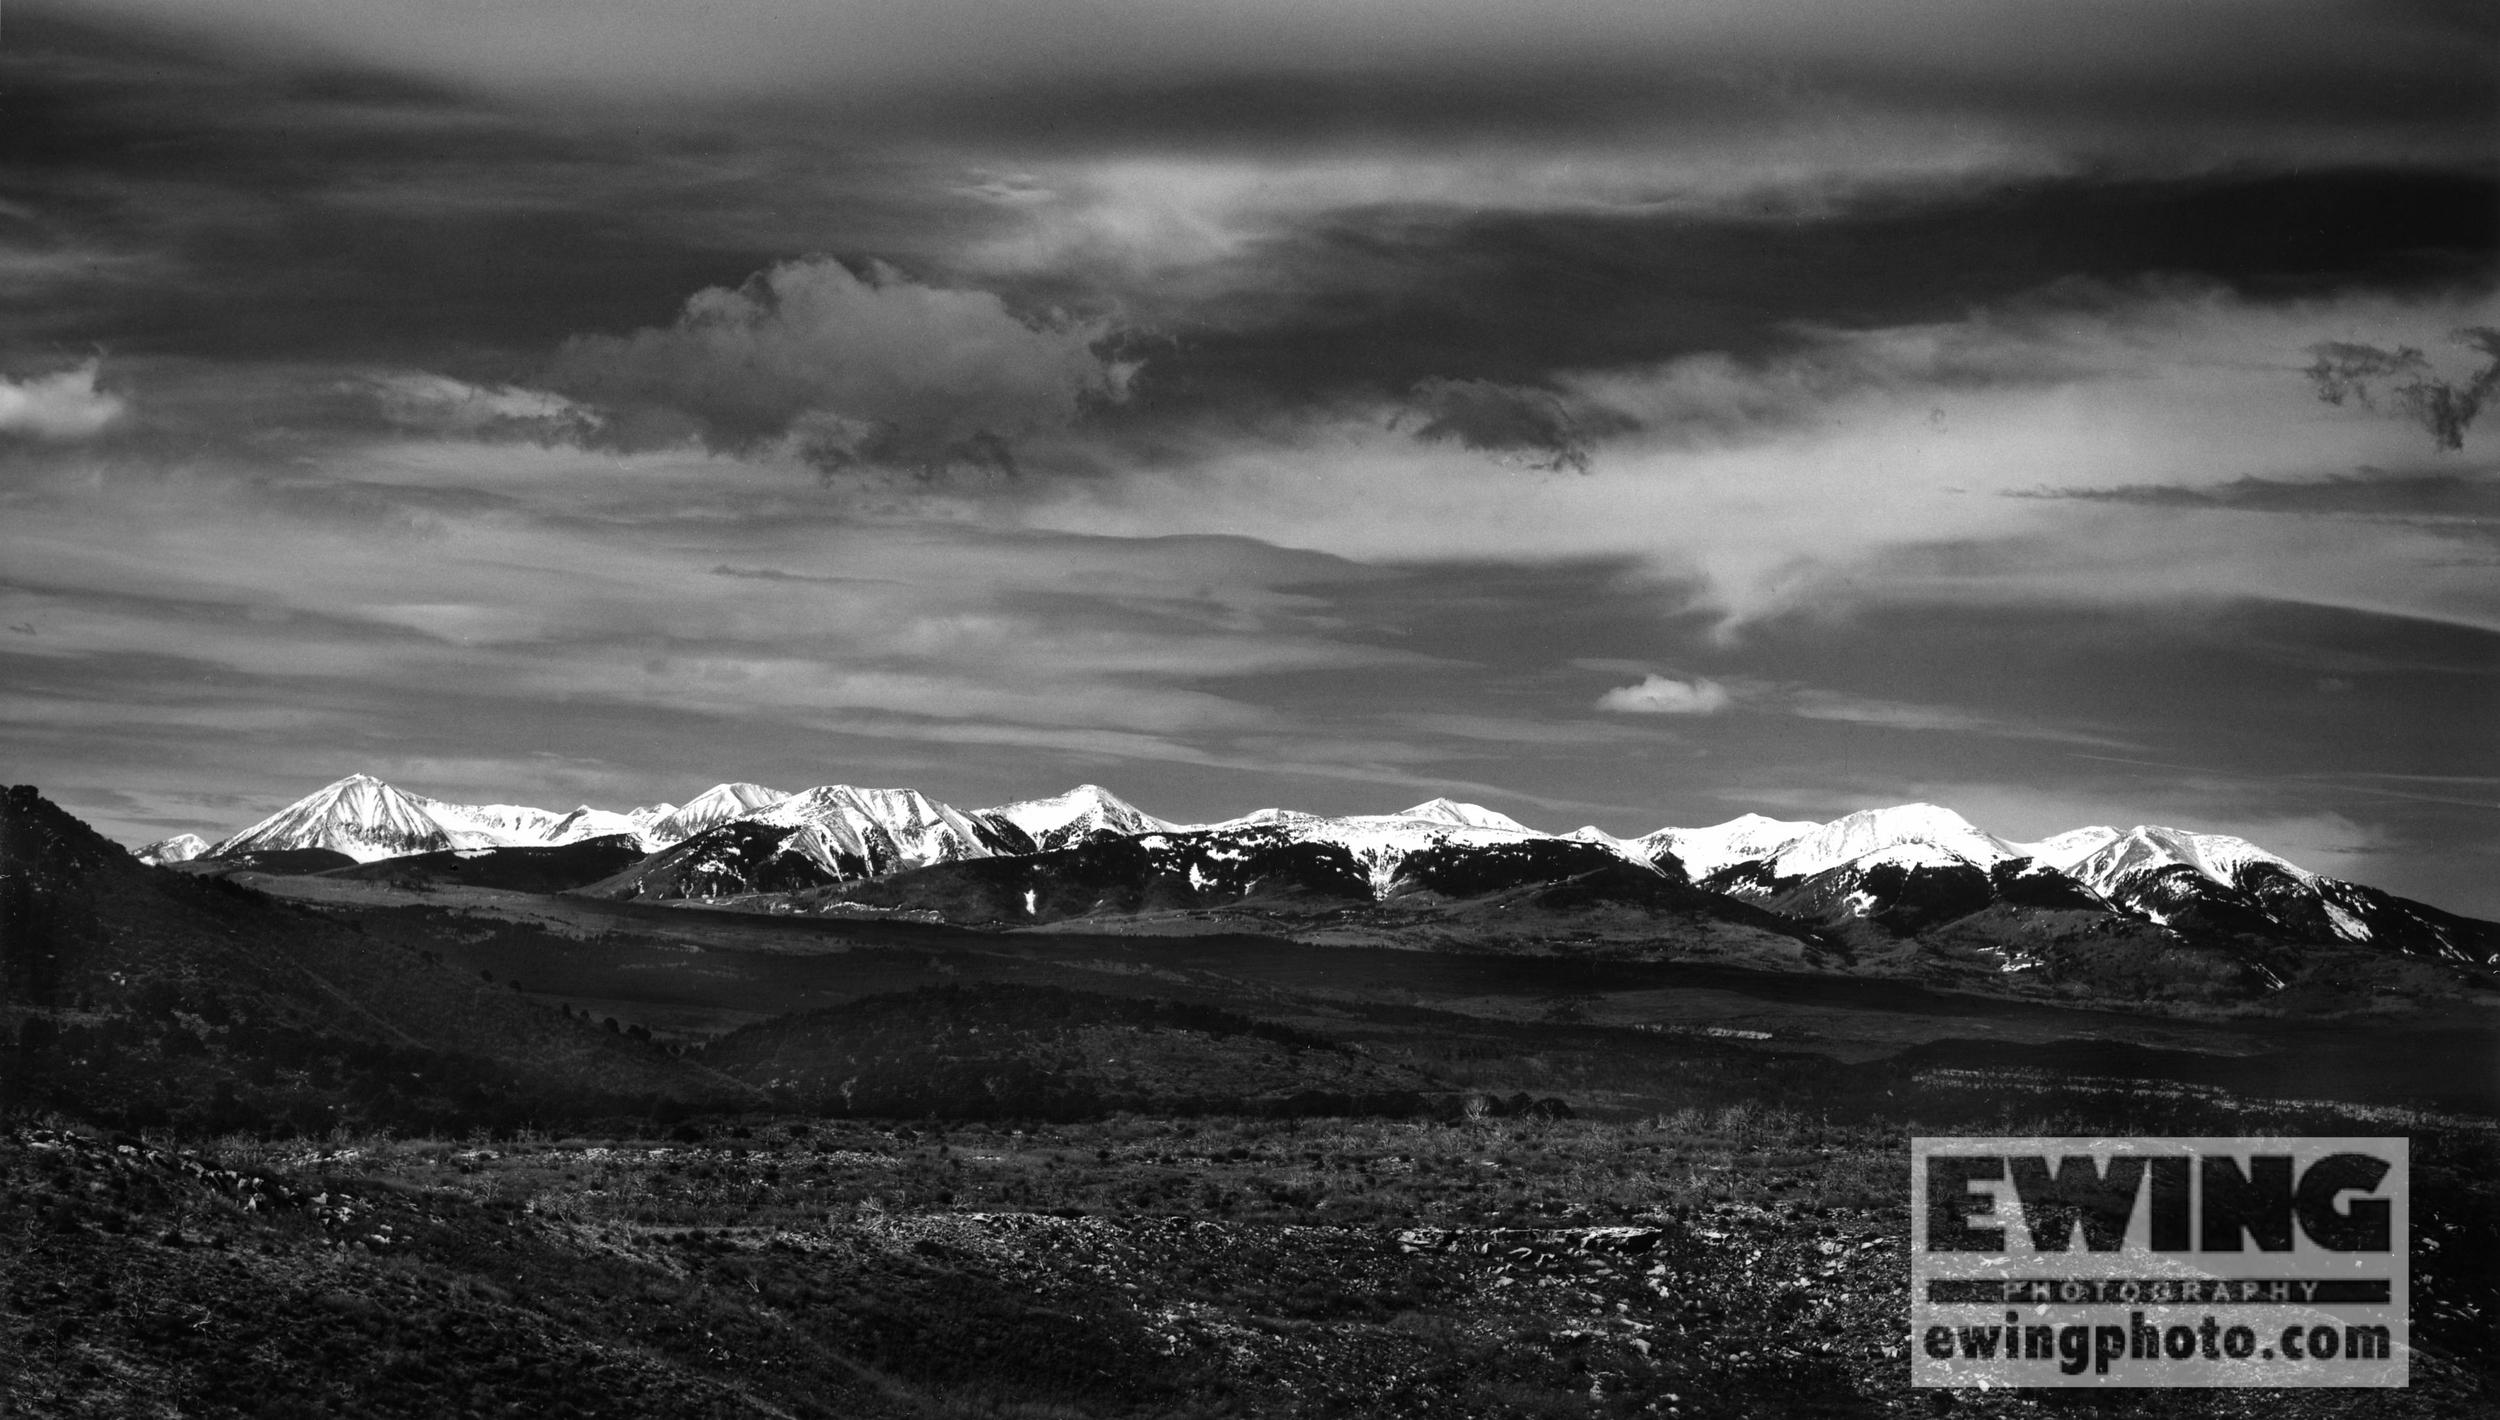 La Sal Mountains CO/UT The Uncompahgre Plateau